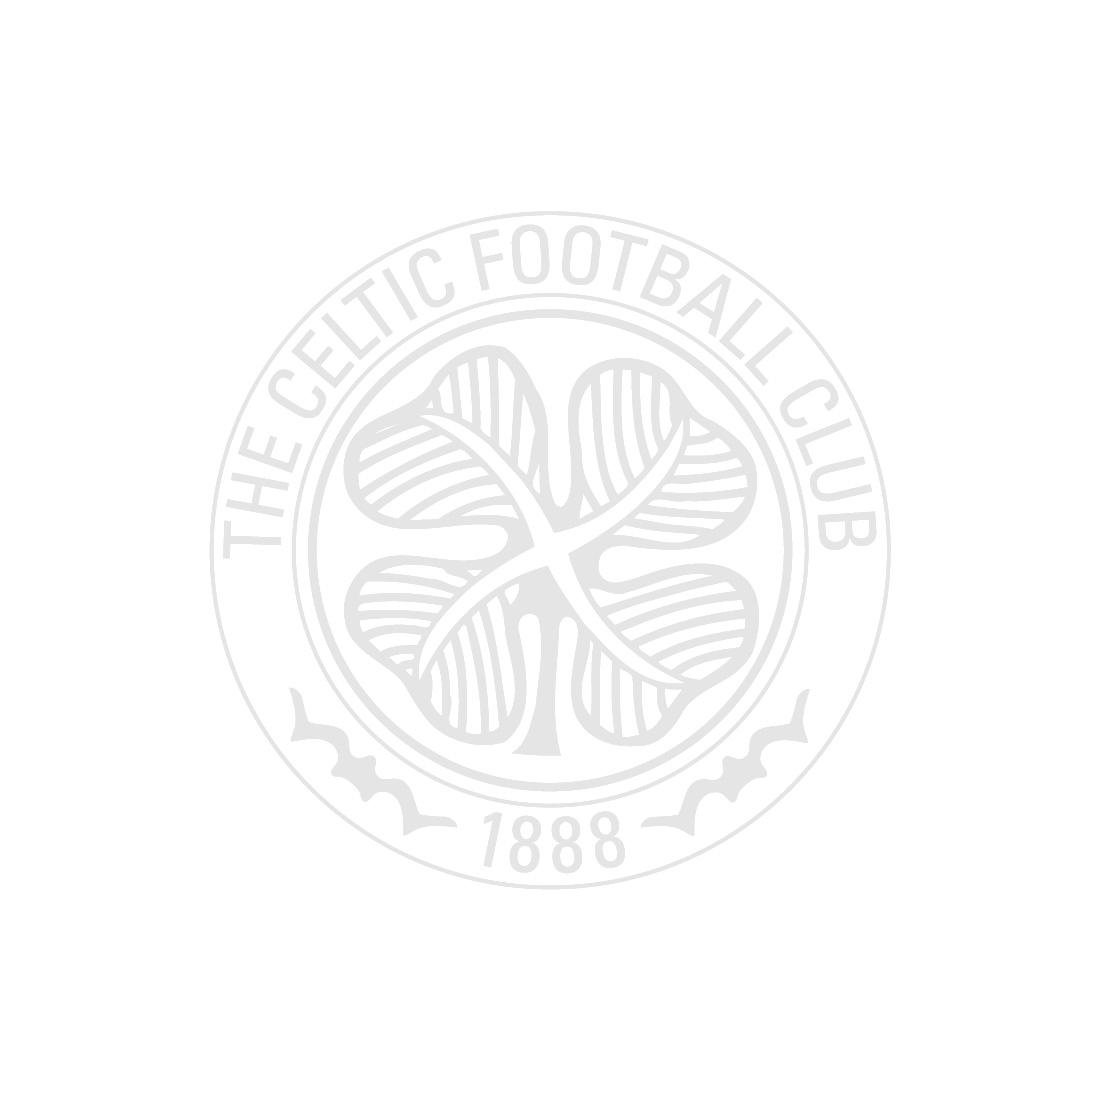 Celtic Euro Training Match Day Jersey - No Sponsor